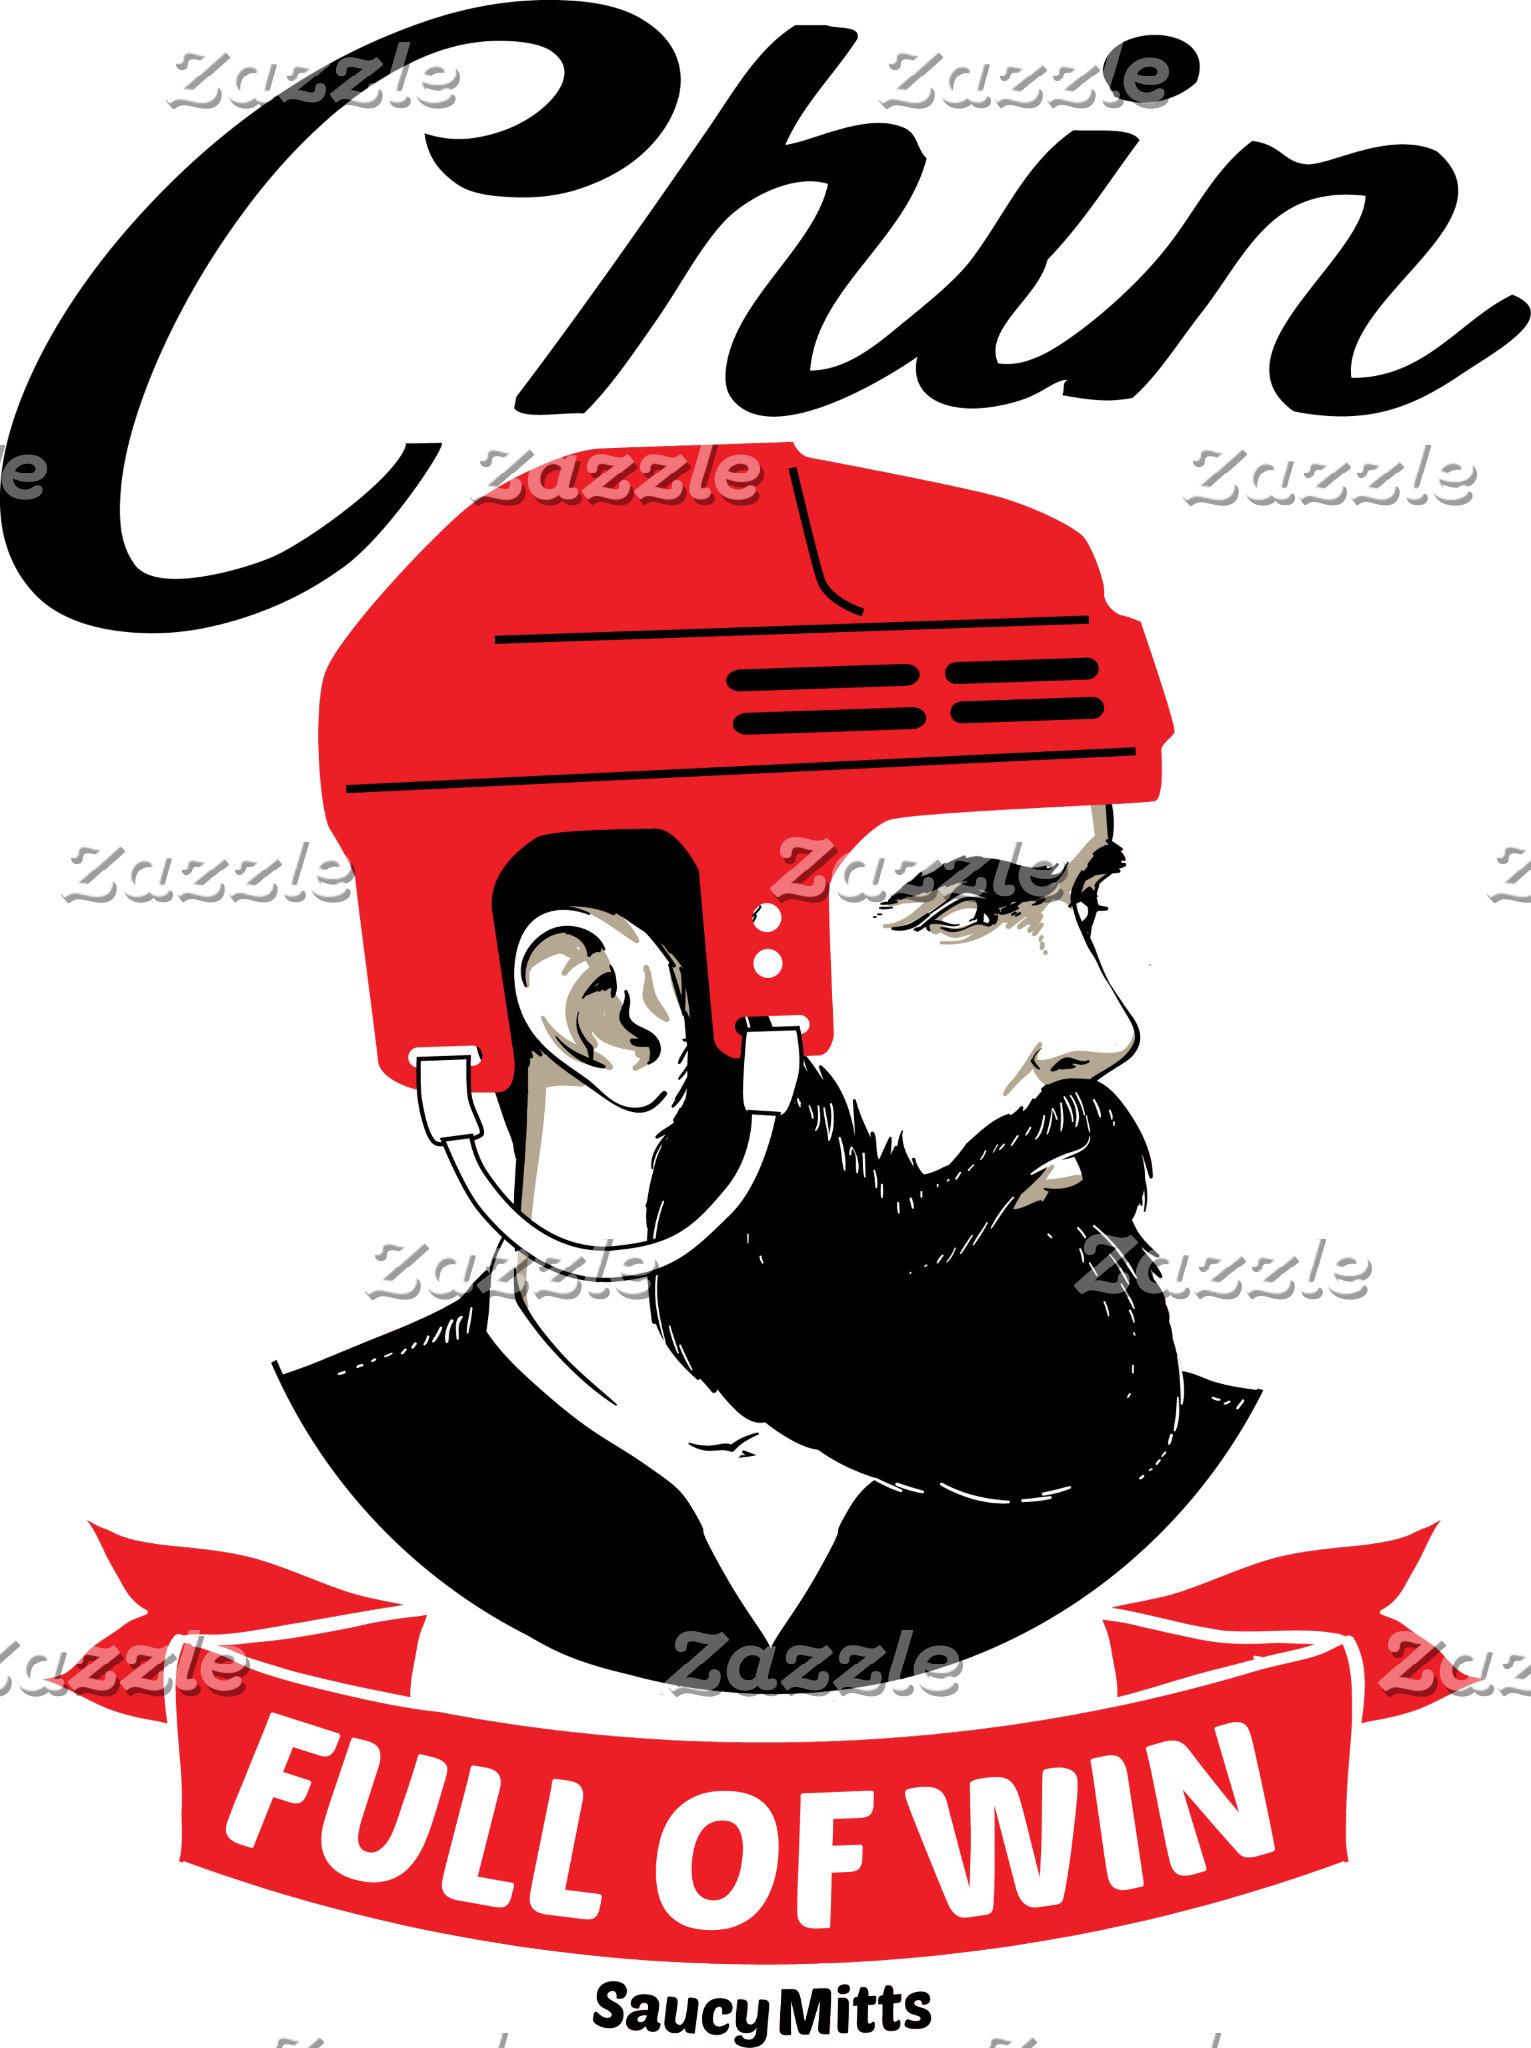 Hockey Chin Full Of Win